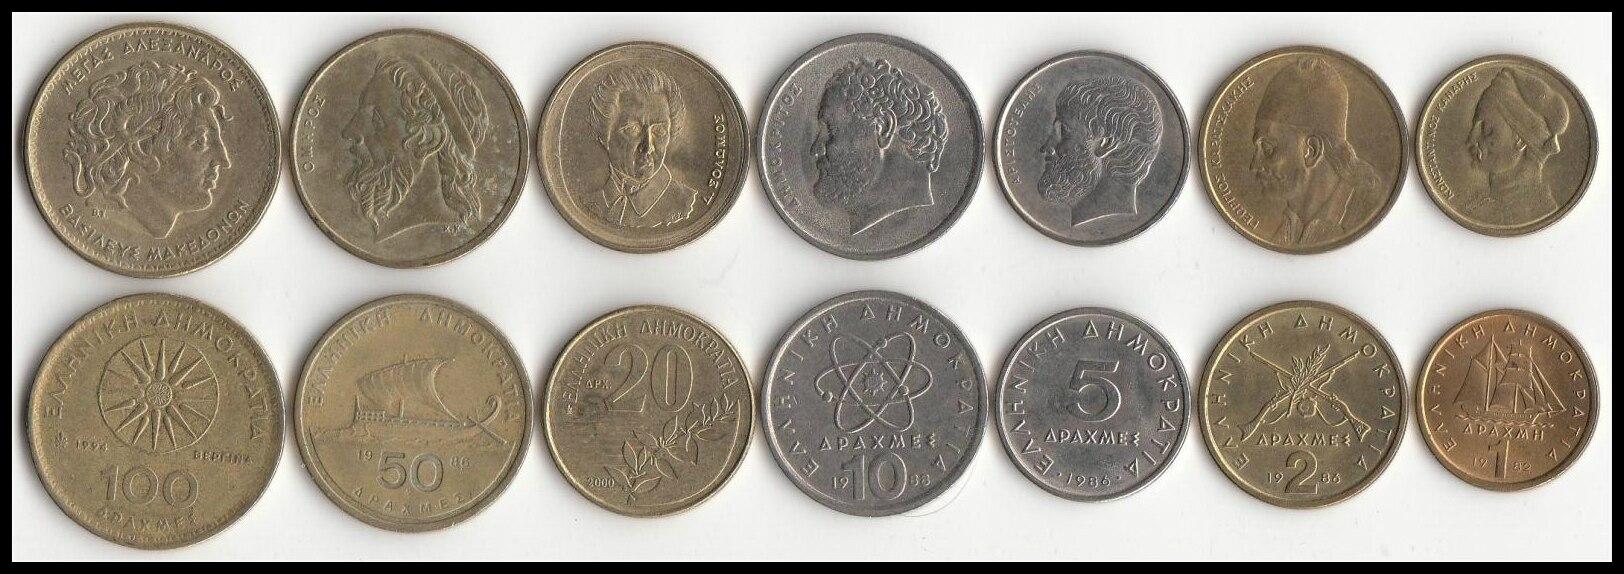 Greece Coin 7 Pieces 1 Set Europe Original Coins Rare Commemorative Edition 100% Real Eu Random Year